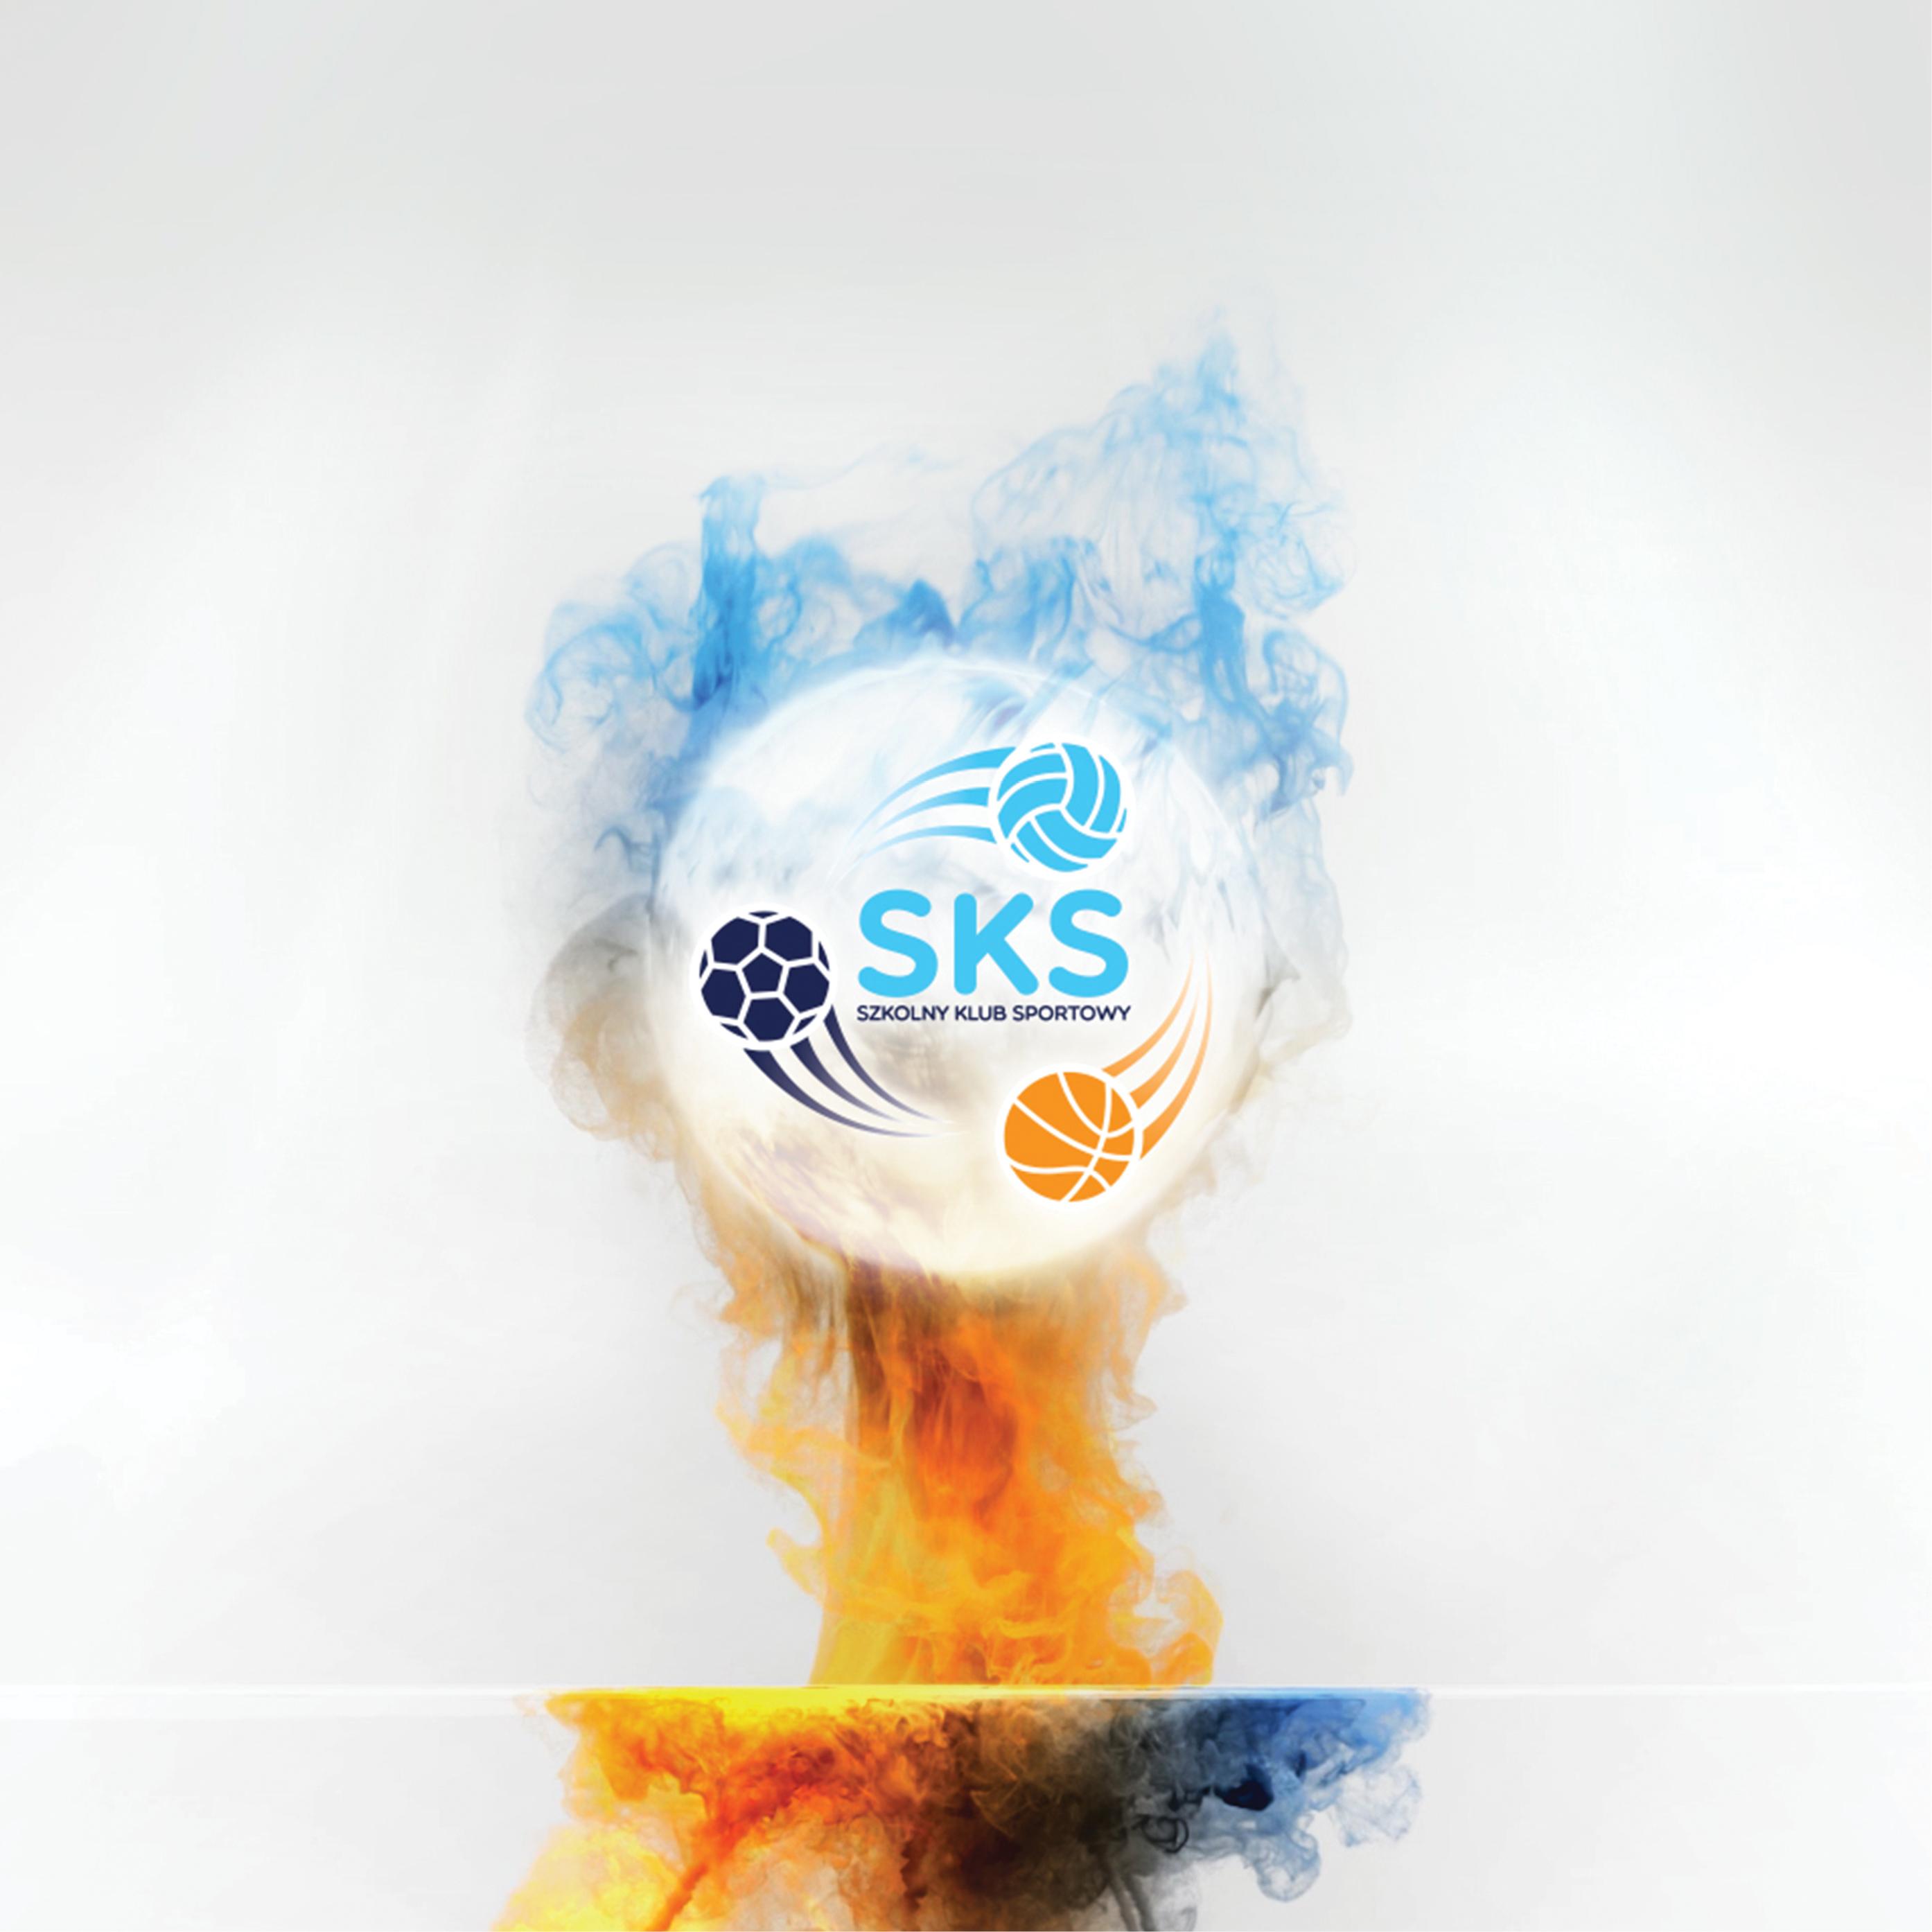 sks2.png